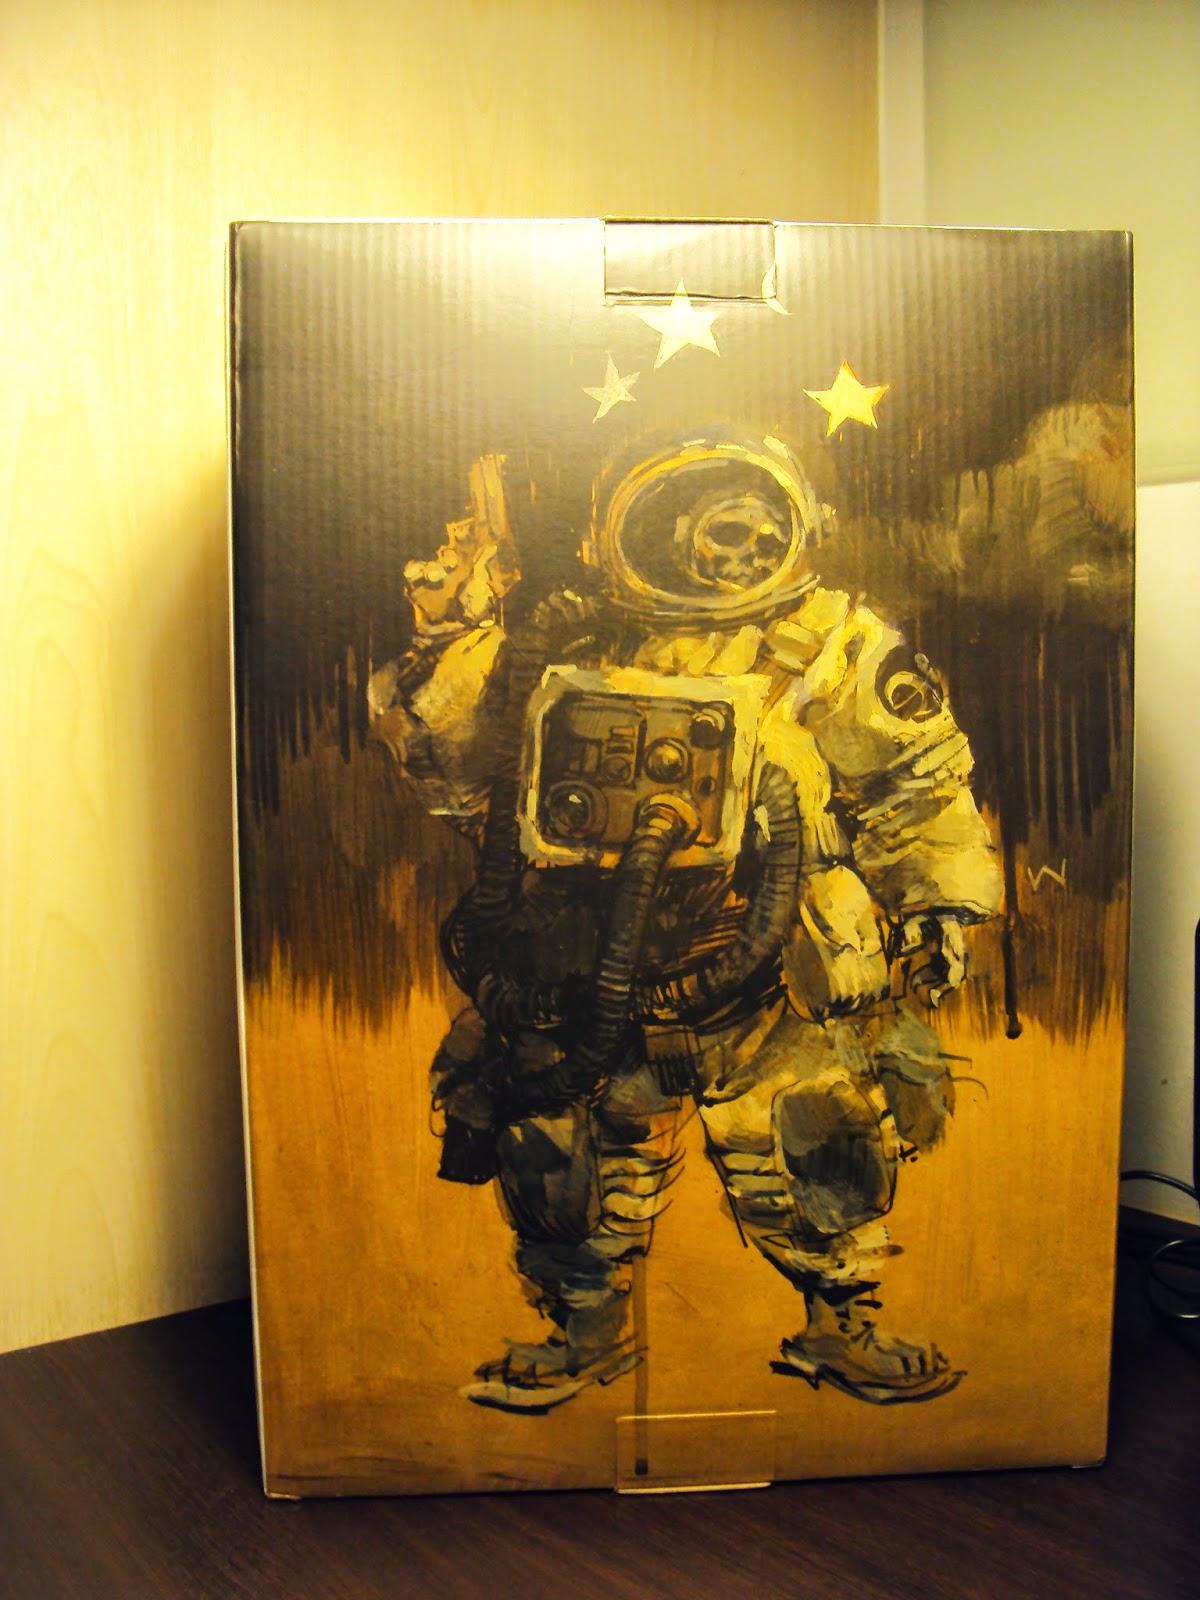 gravity dead astronaut face - photo #31